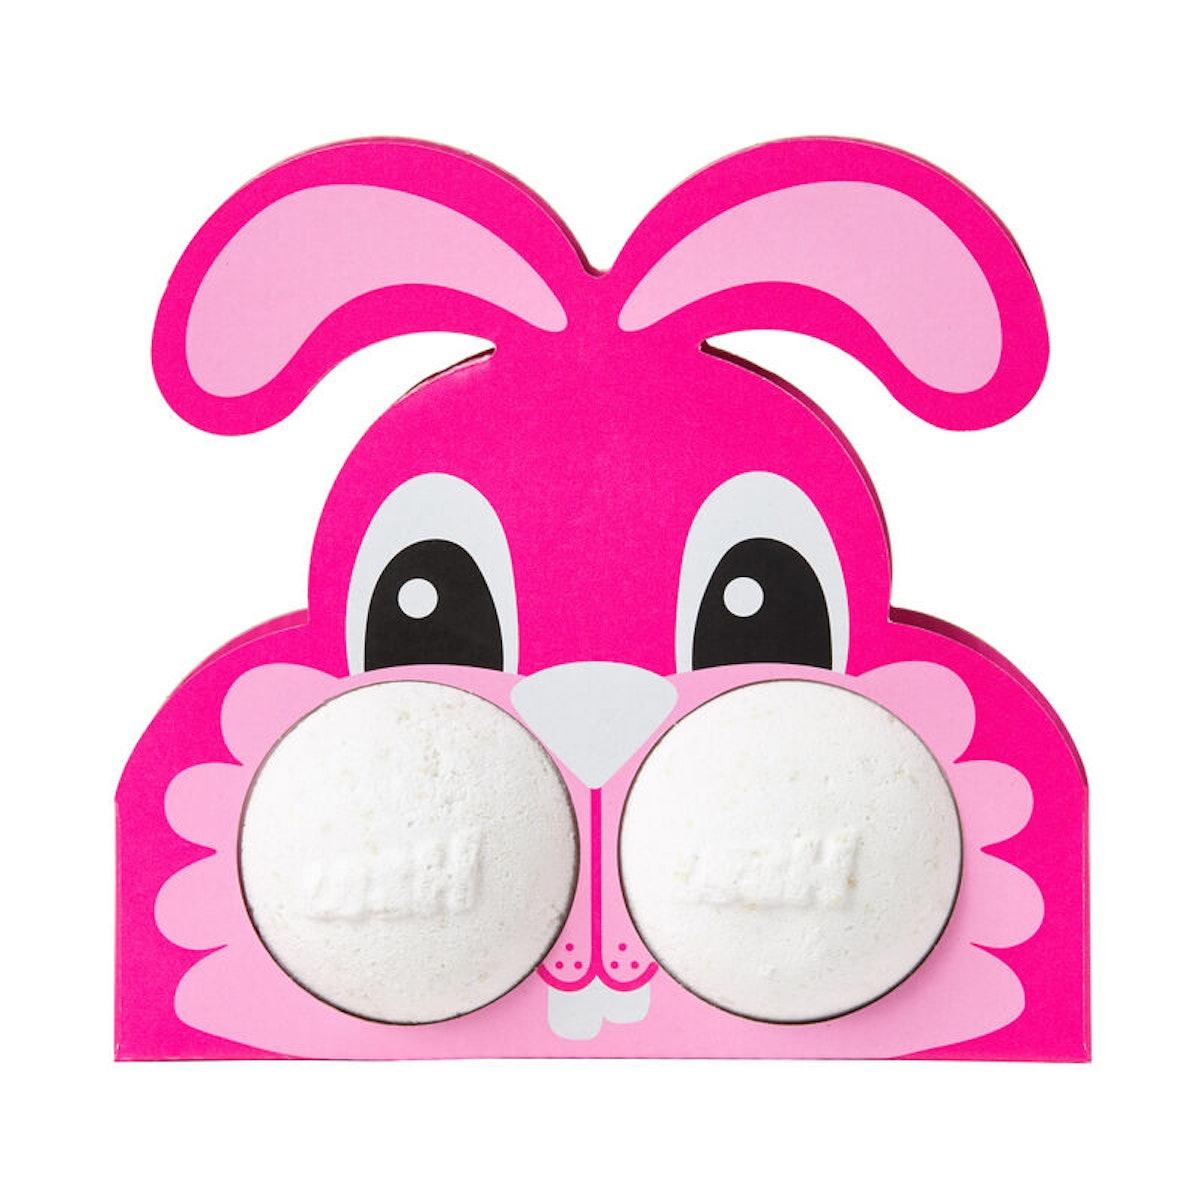 Lush Bunny Buttercheeks